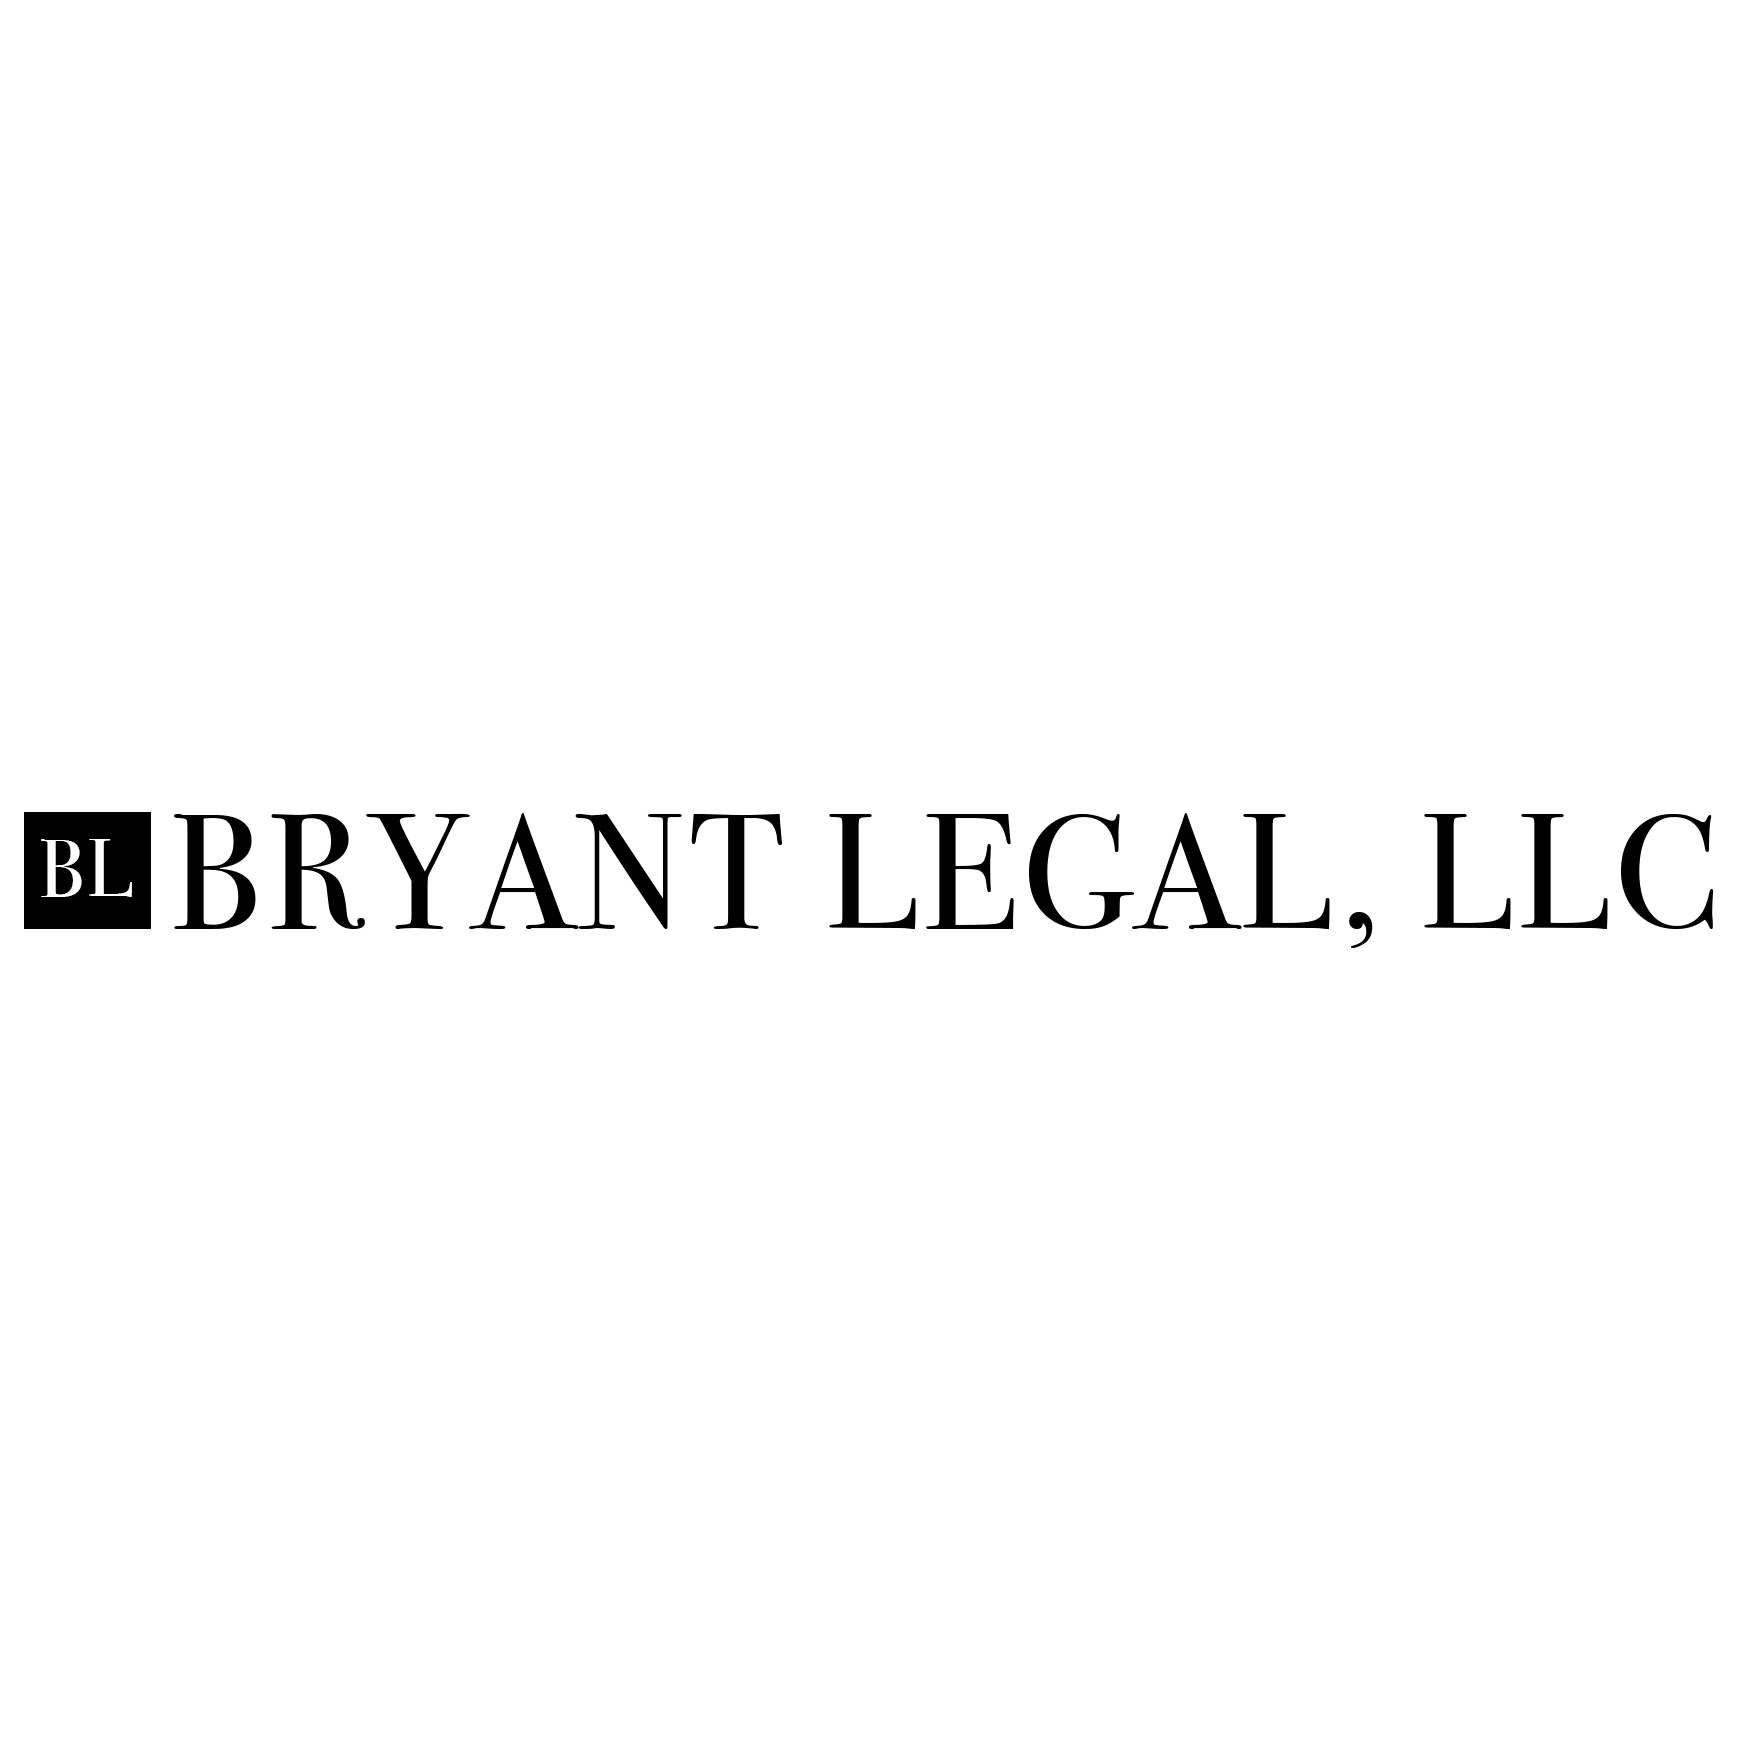 Bryant Legal, LLC image 0